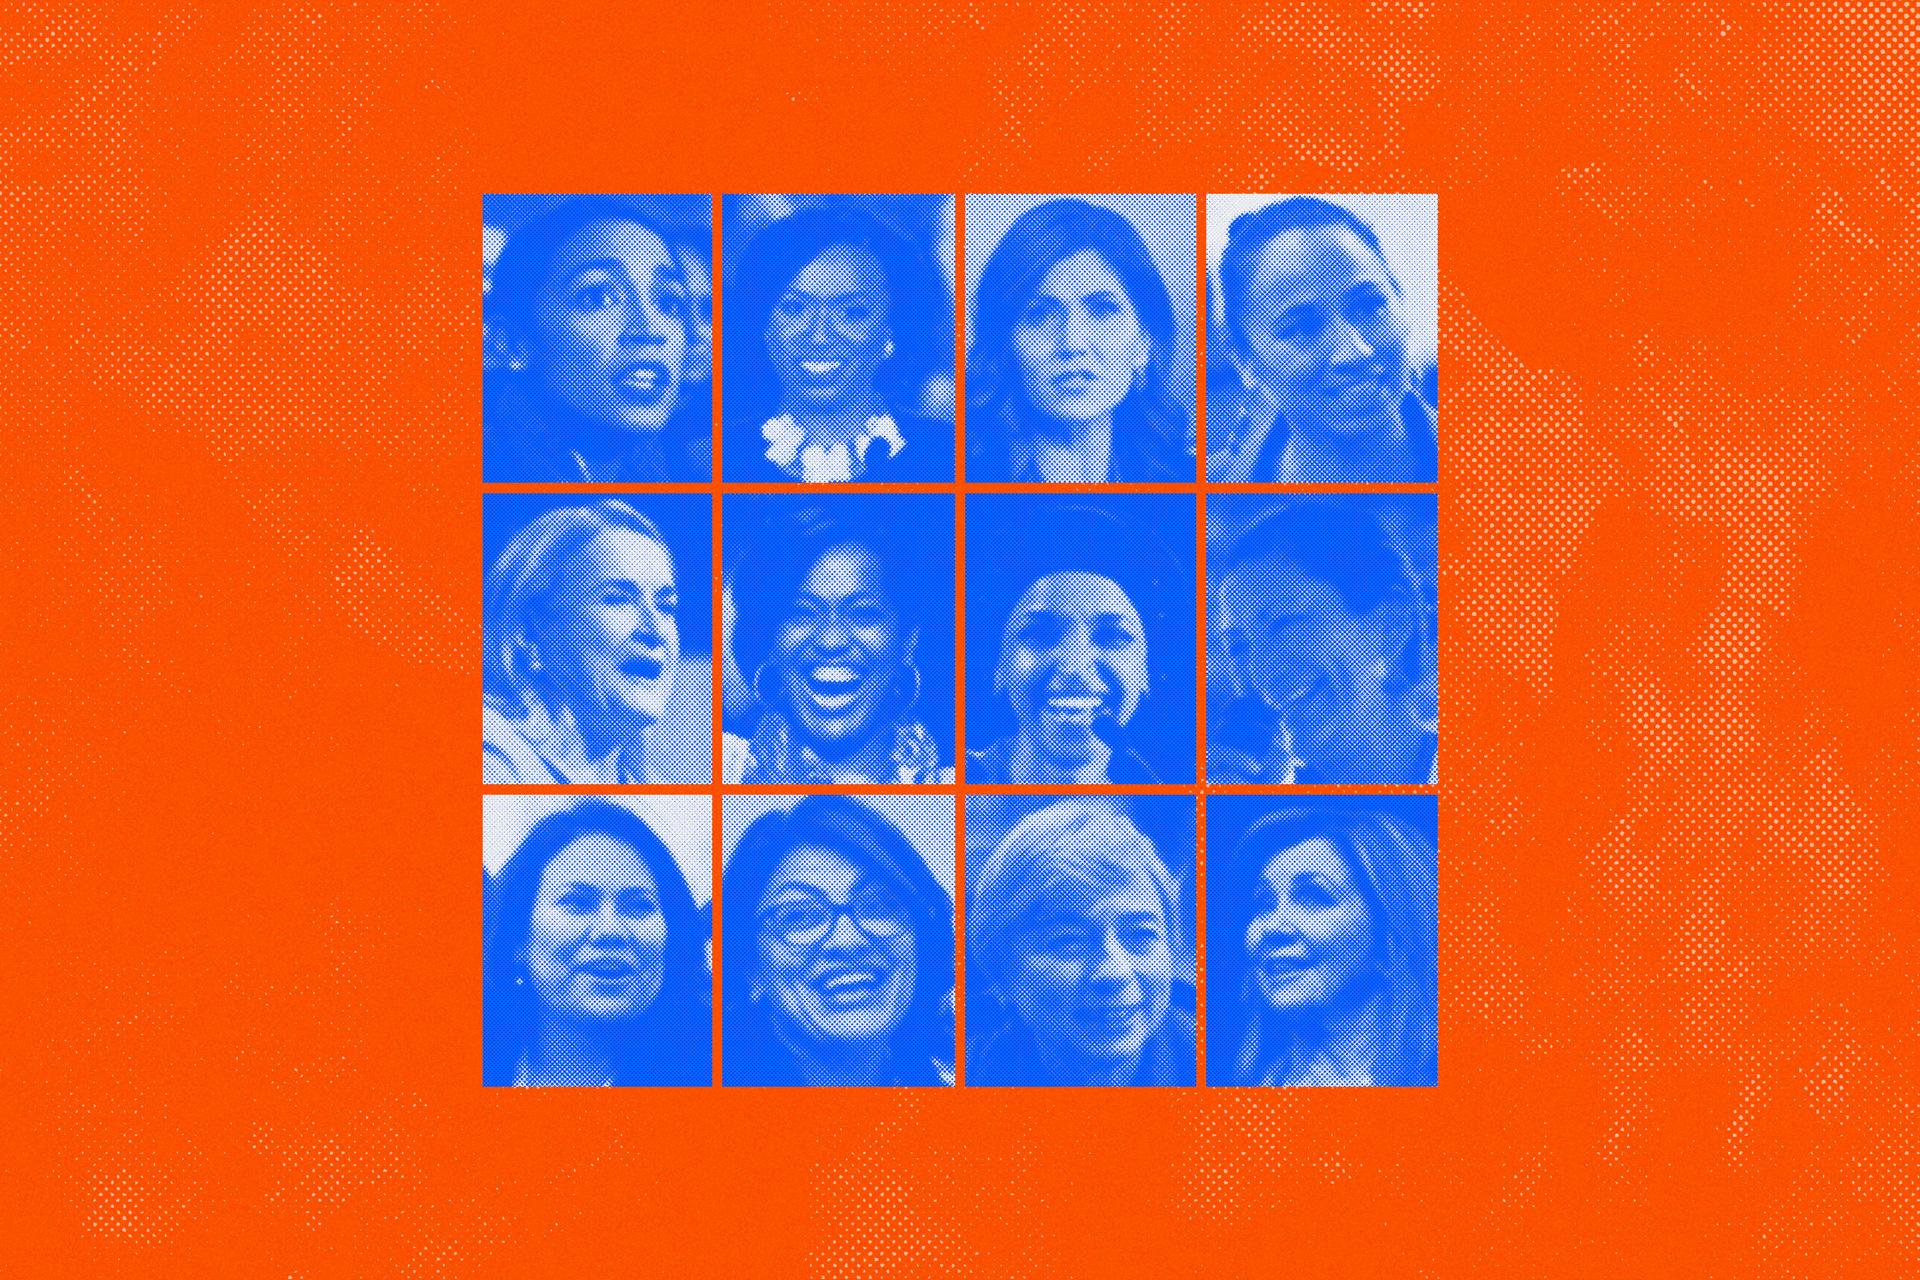 From left to right, top to bottom: Alexandria Ocasio-Cortez, Ayana Pressley, Kristi Noem, Sharice Davids, Sylvia Garcia, Jahana Hayes, Ilhan Omar, Deb Haaland, Veronica Escobar, Rashida Tlaib, Janet Mills and Marsha Blackburn.